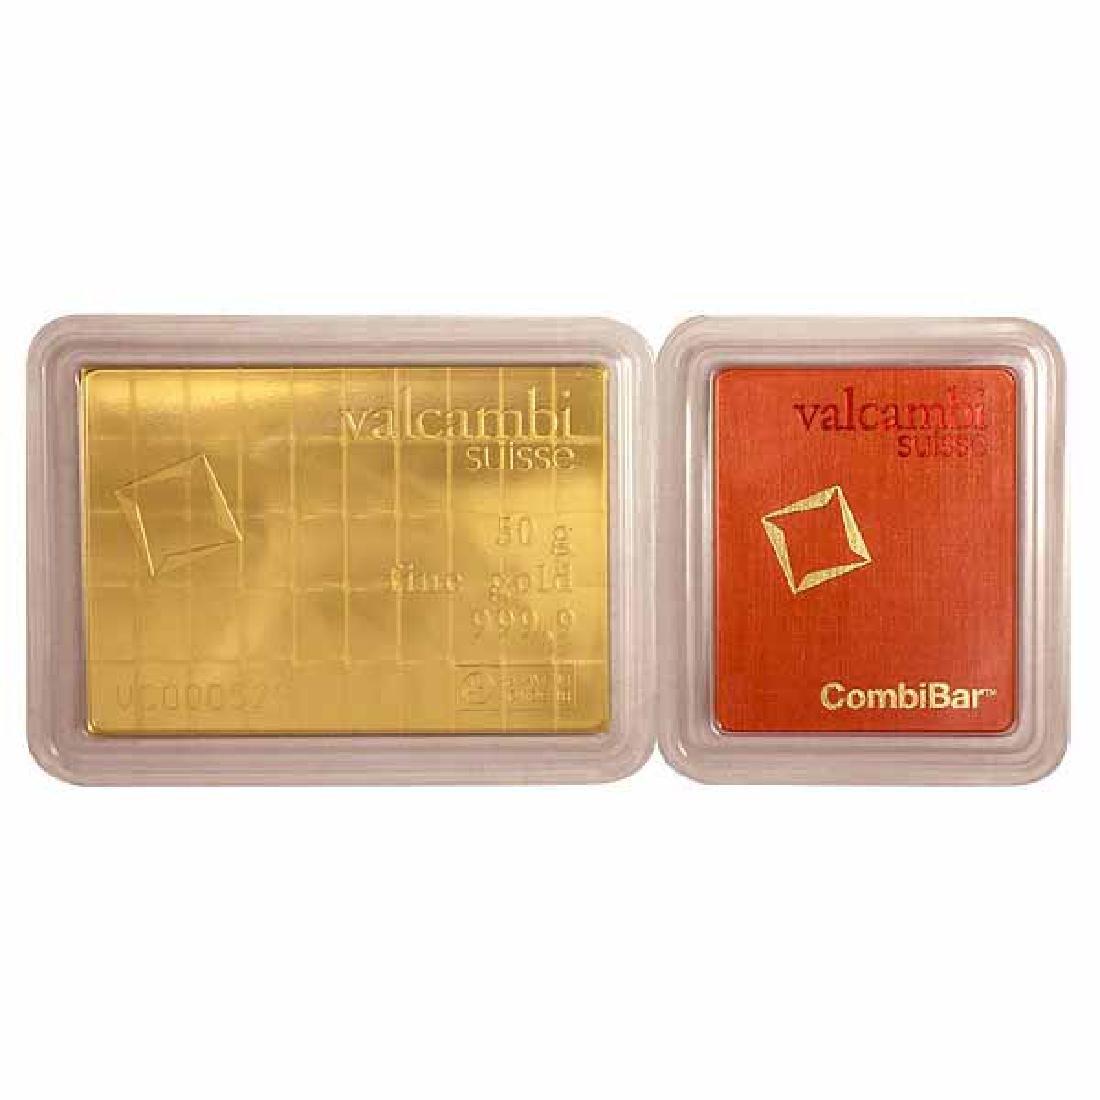 Valcambi Suisse 50 Gram Gold CombiBar